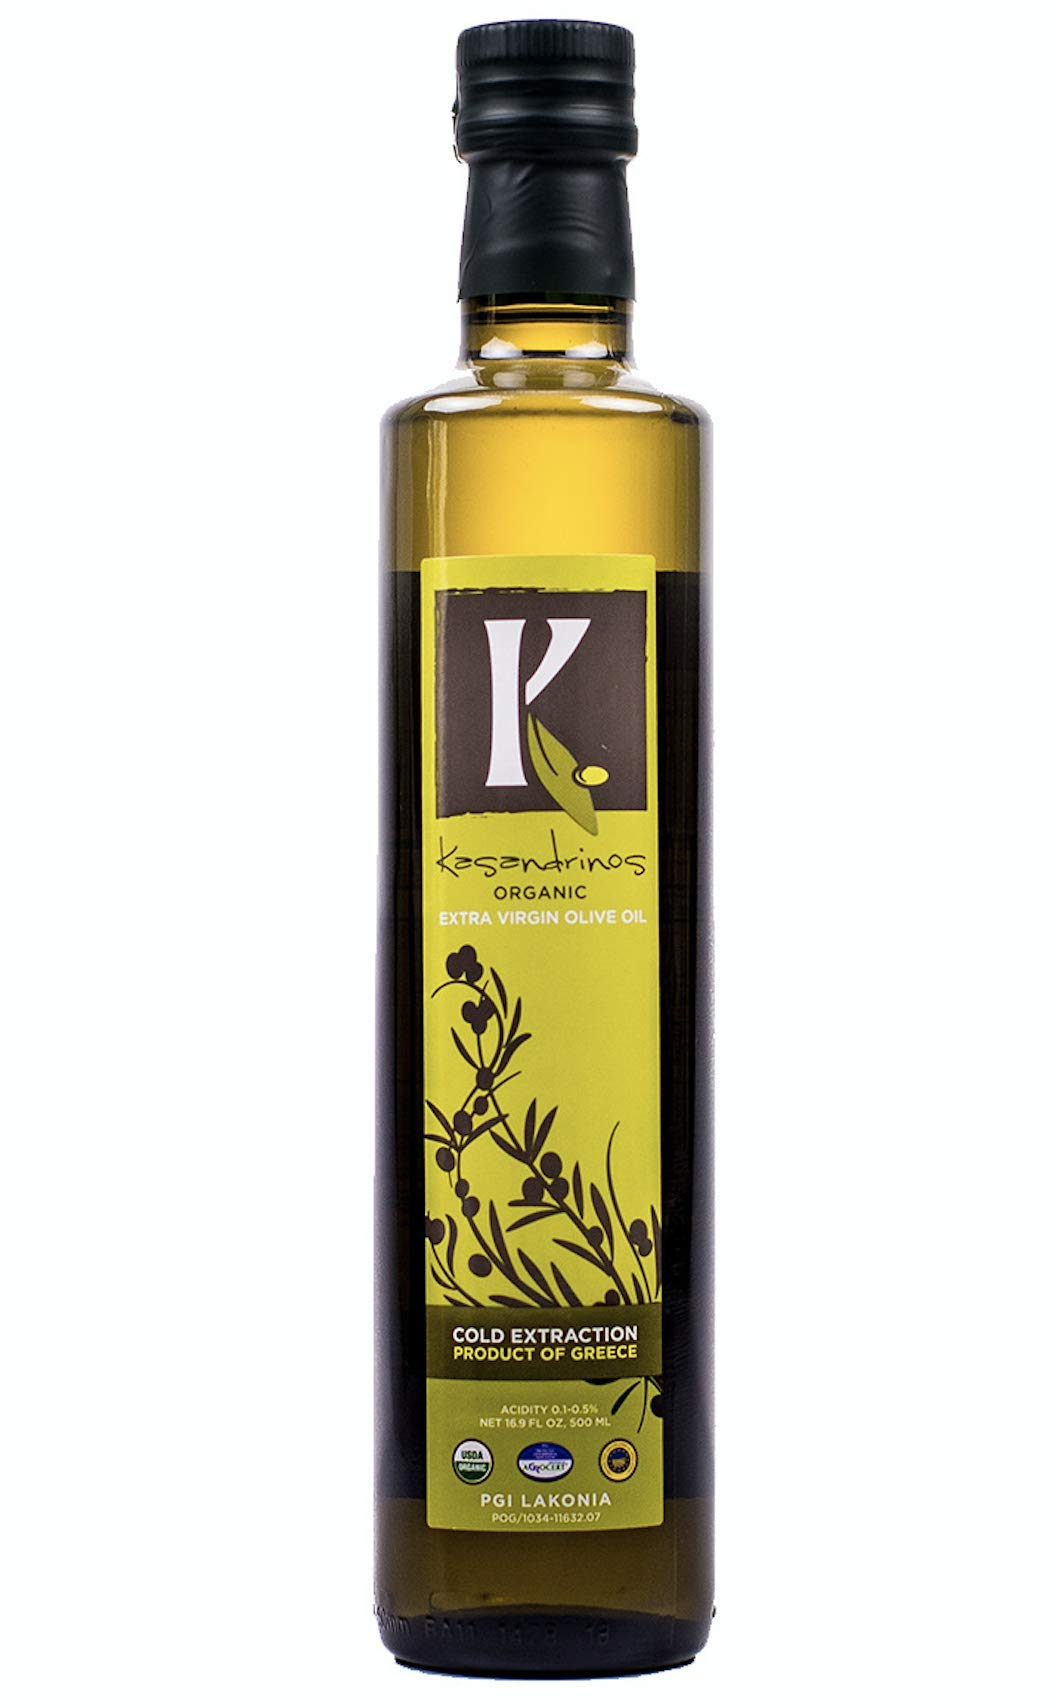 Kasandrinos 500 ML Bottle Organic Extra Virgin Greek Olive Oil - 2018/19 Harvest - NonGMO Keto Paleo, 100% Organic First Cold Pressed, Single Sourced from Greece Robust moisturizing by Kasandrinos